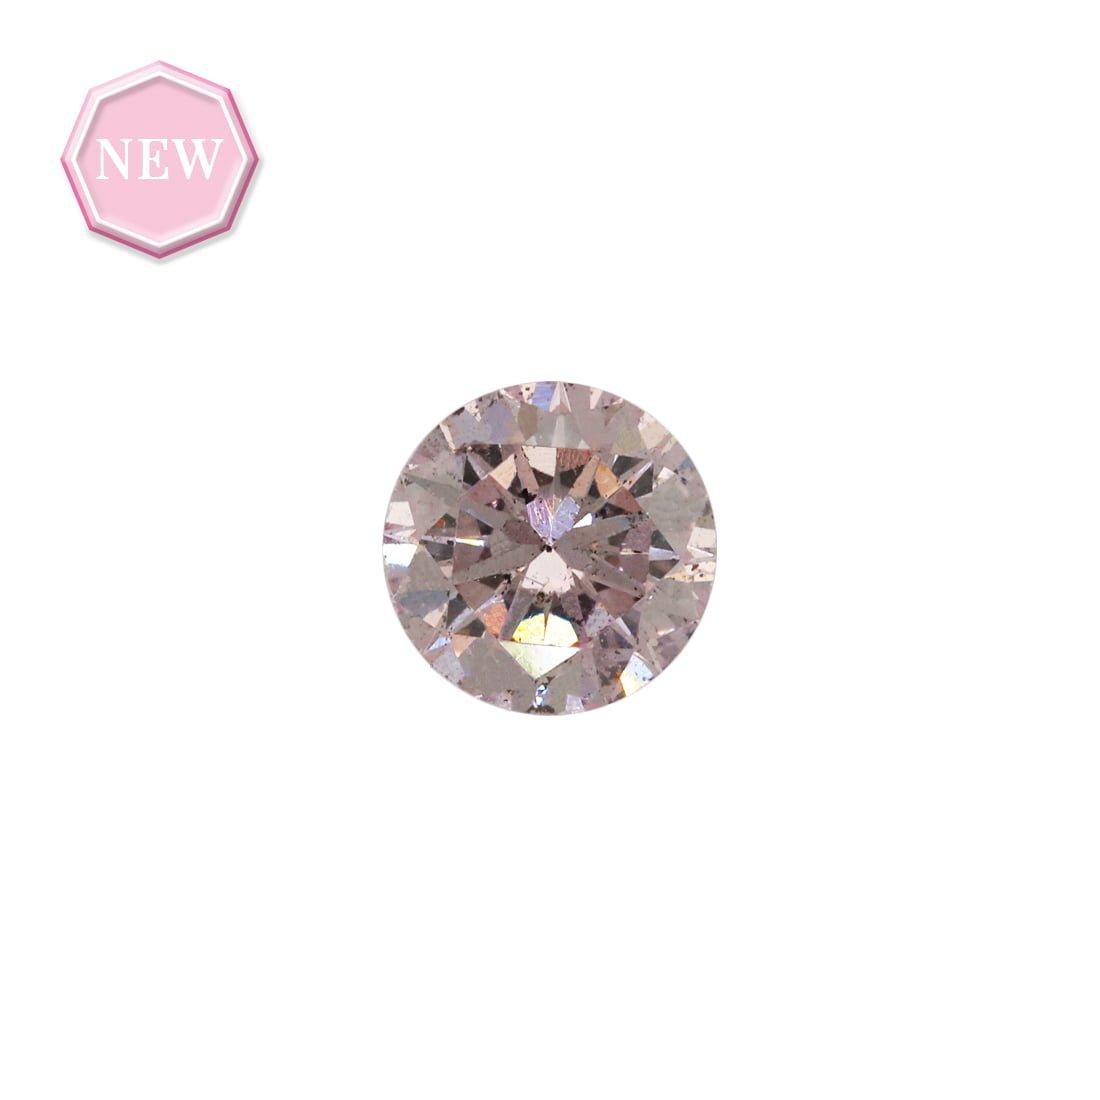 0.34ct Natural Fancy Pink I1, 8P Argyle Diamond